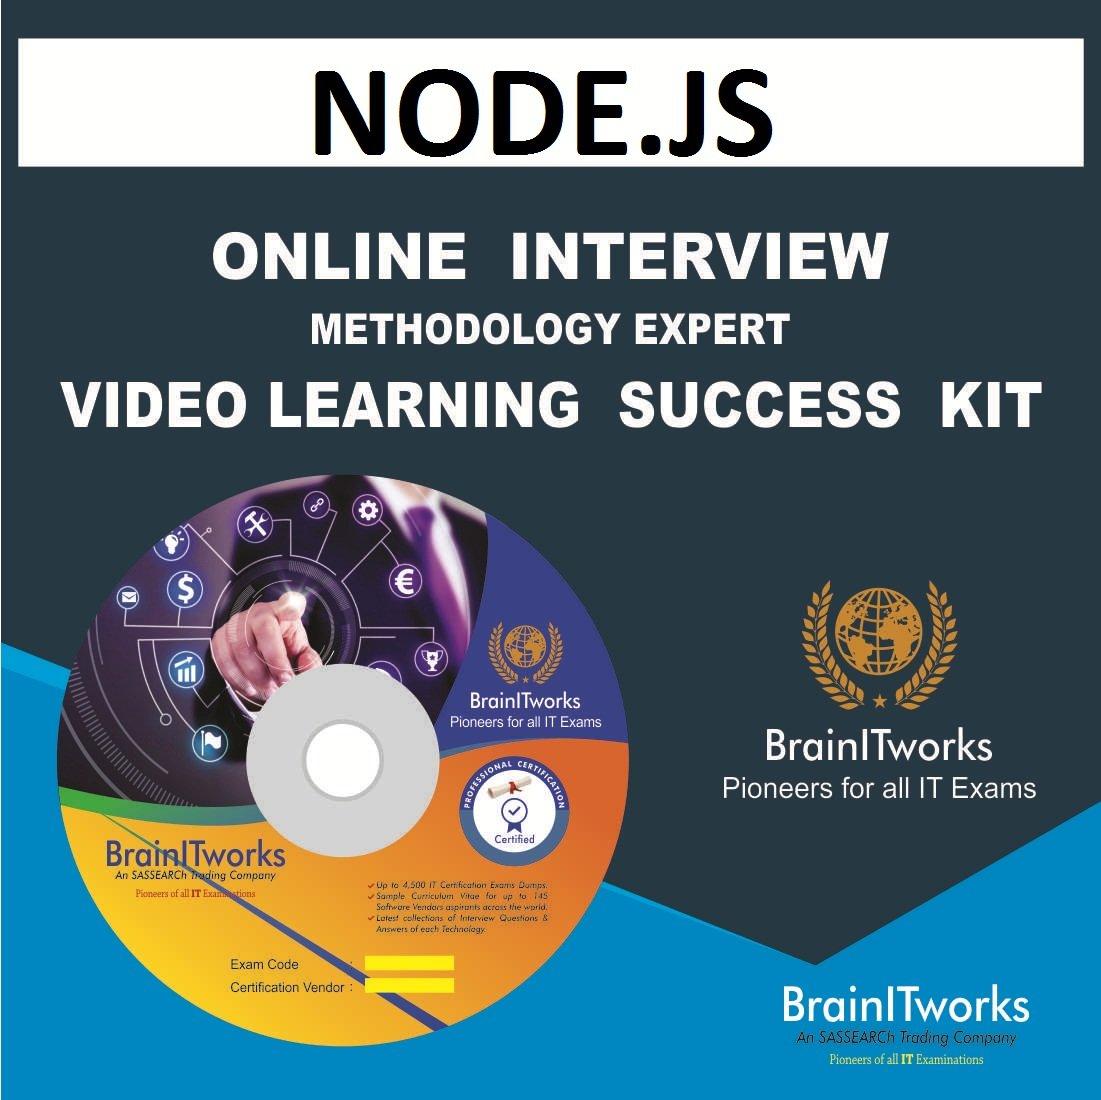 Amazon Nodejs Online Interview Video Learning Success Kit